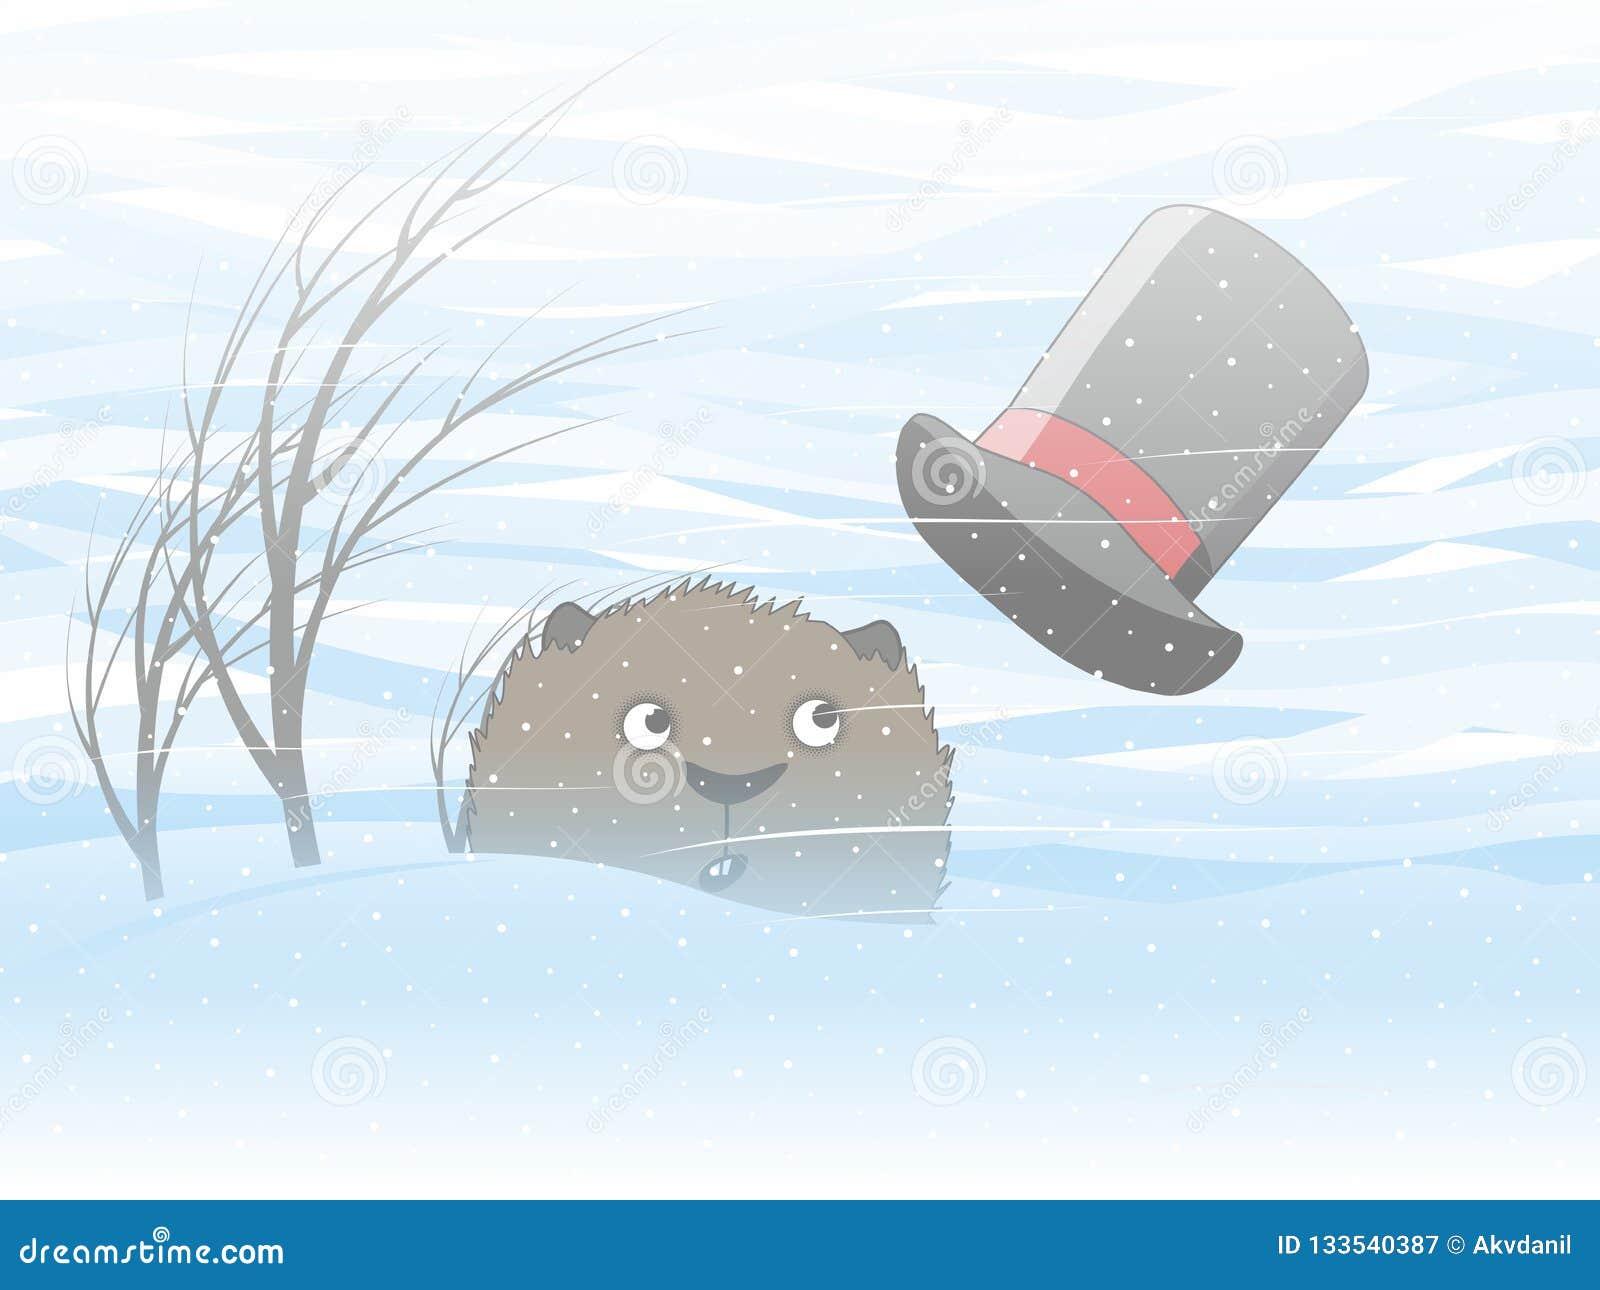 Groundhog Dzień